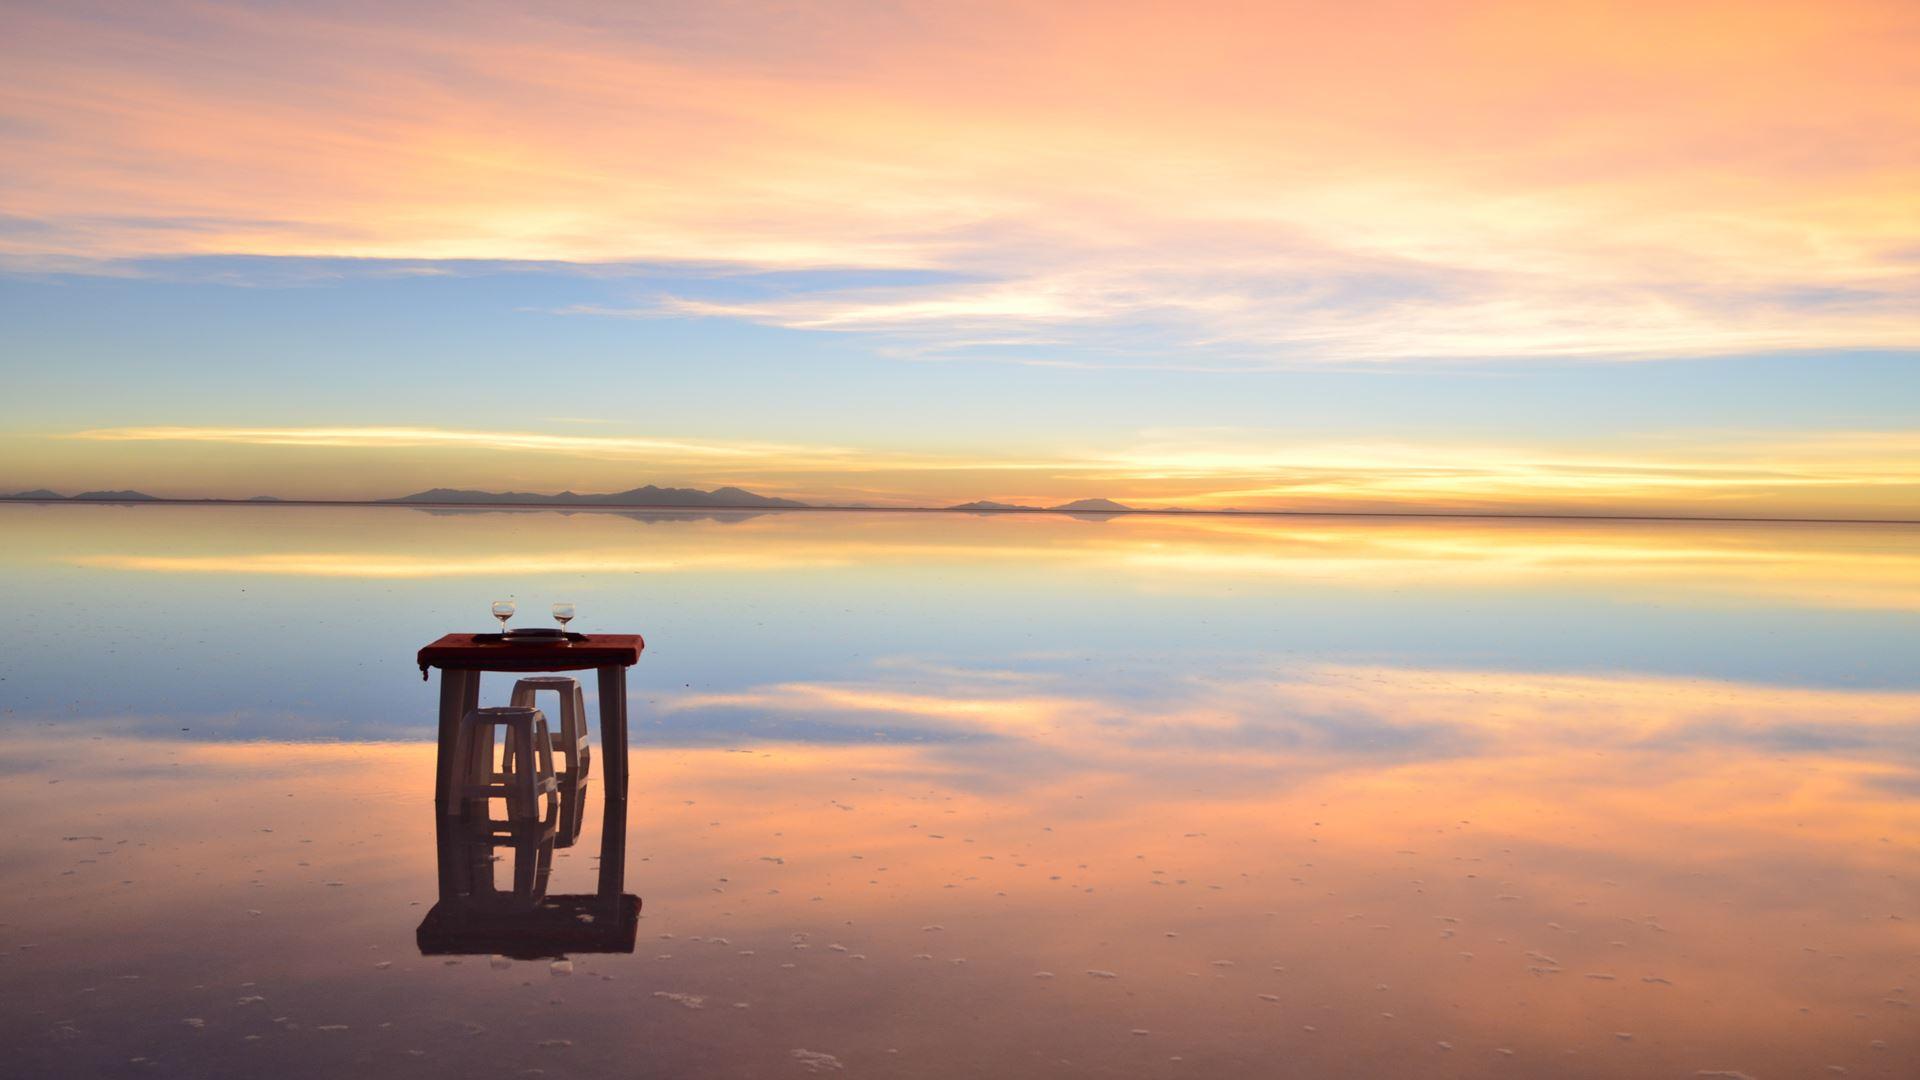 From Villazón to the Salt Flats of Uyuni & Lagoons - 5 days